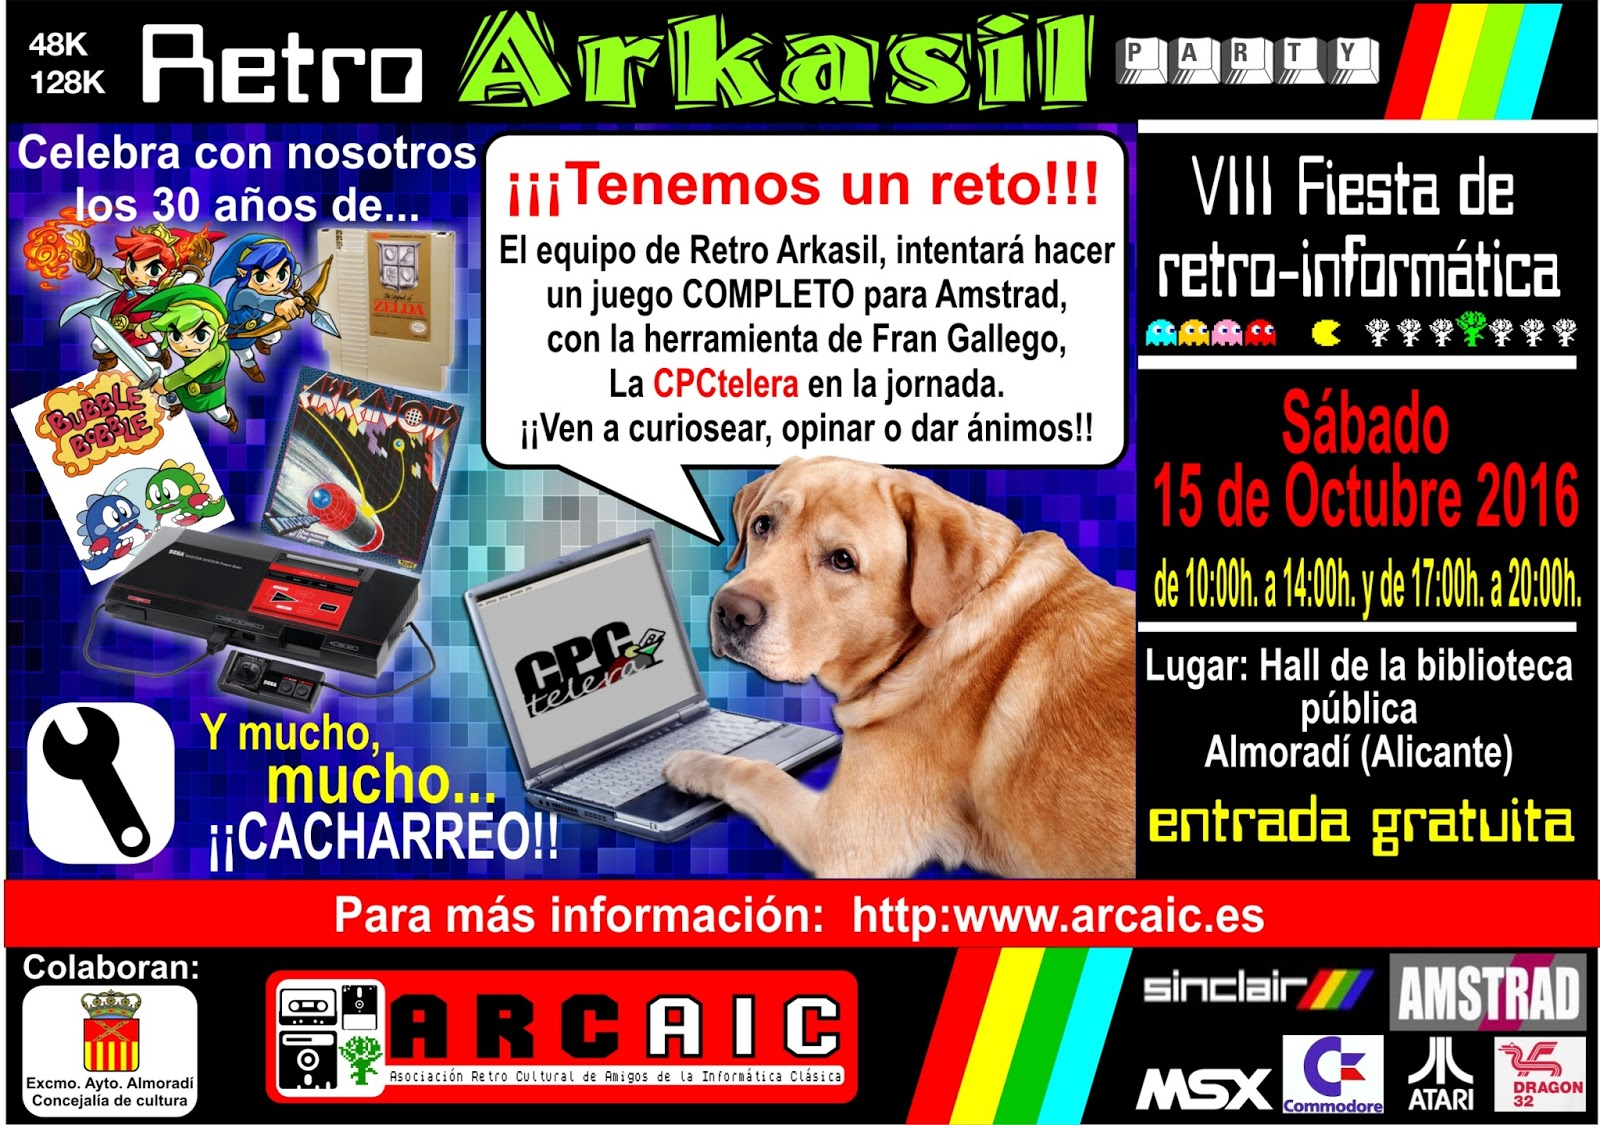 RETRO ARKASIL PARTY VIII - 2016 RETRO%2BARKASIL%2BPARTY%2B2016